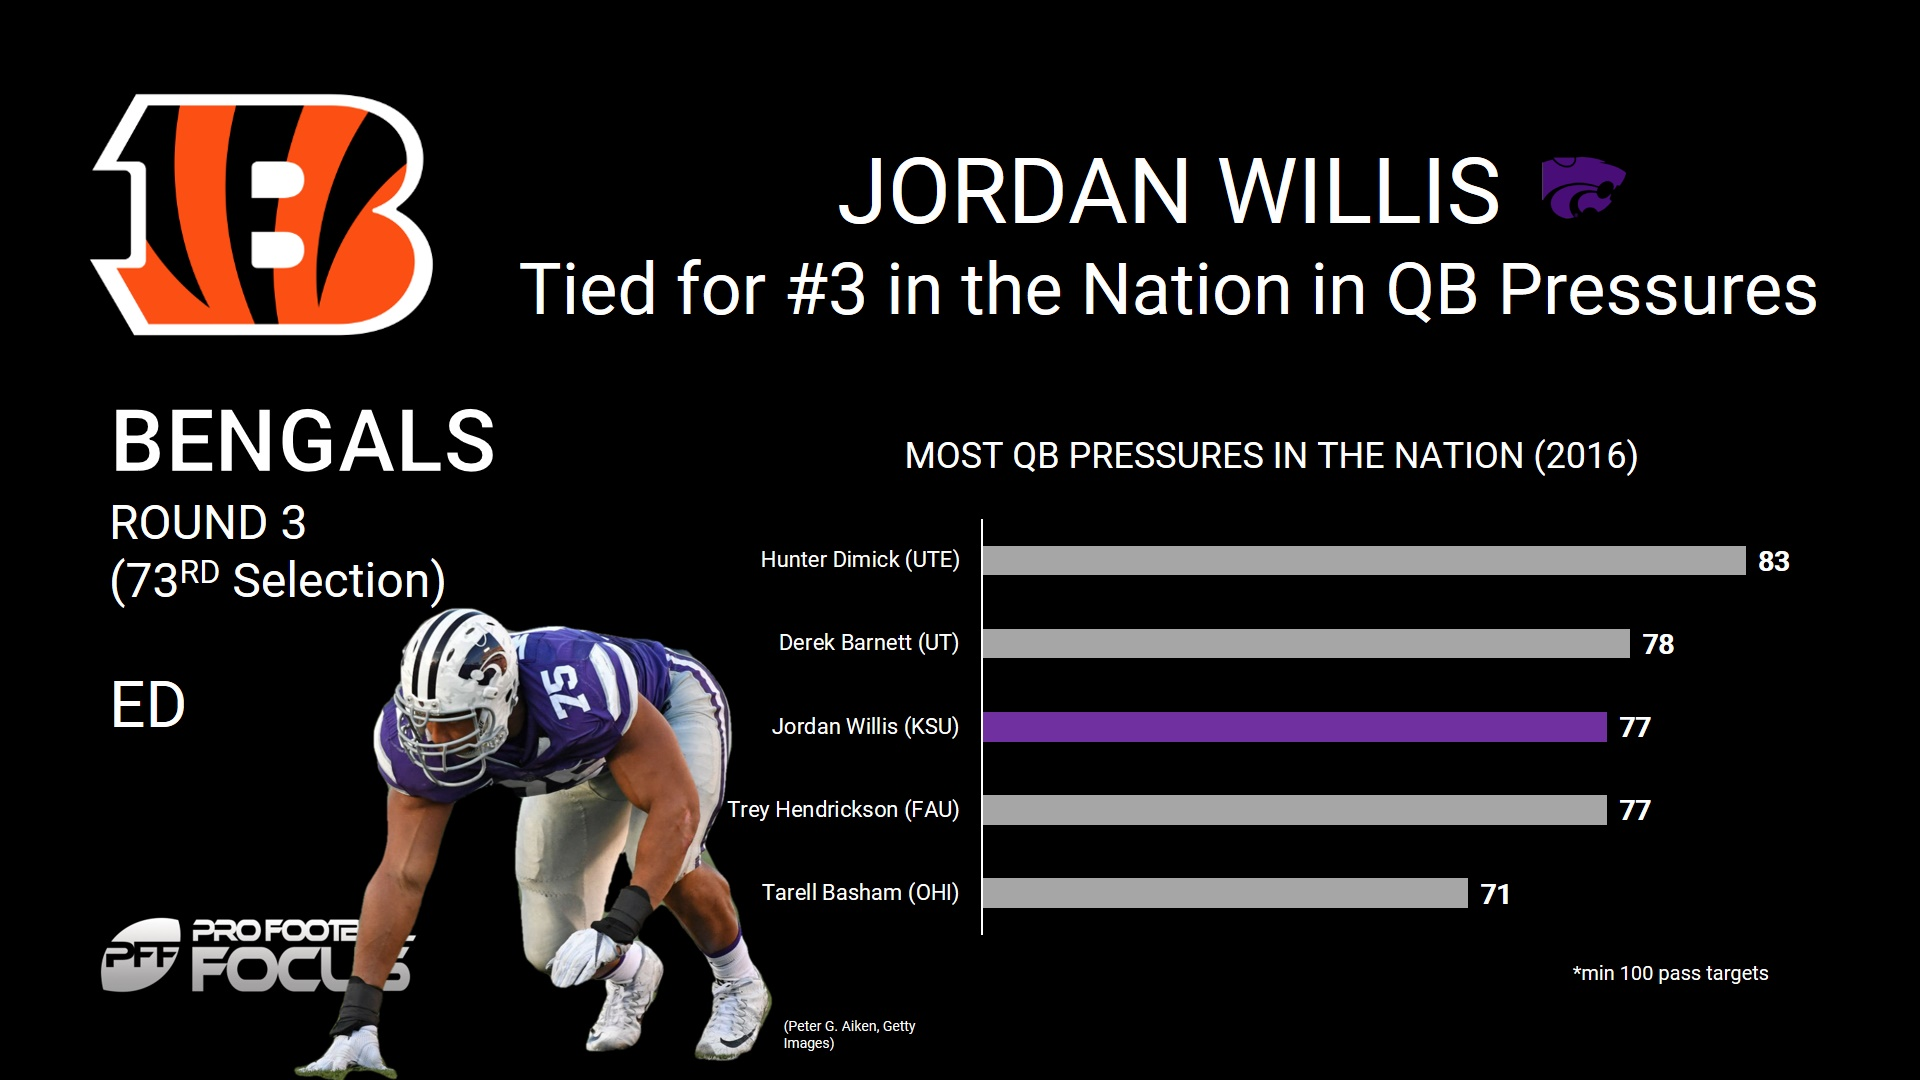 Jordan Willis